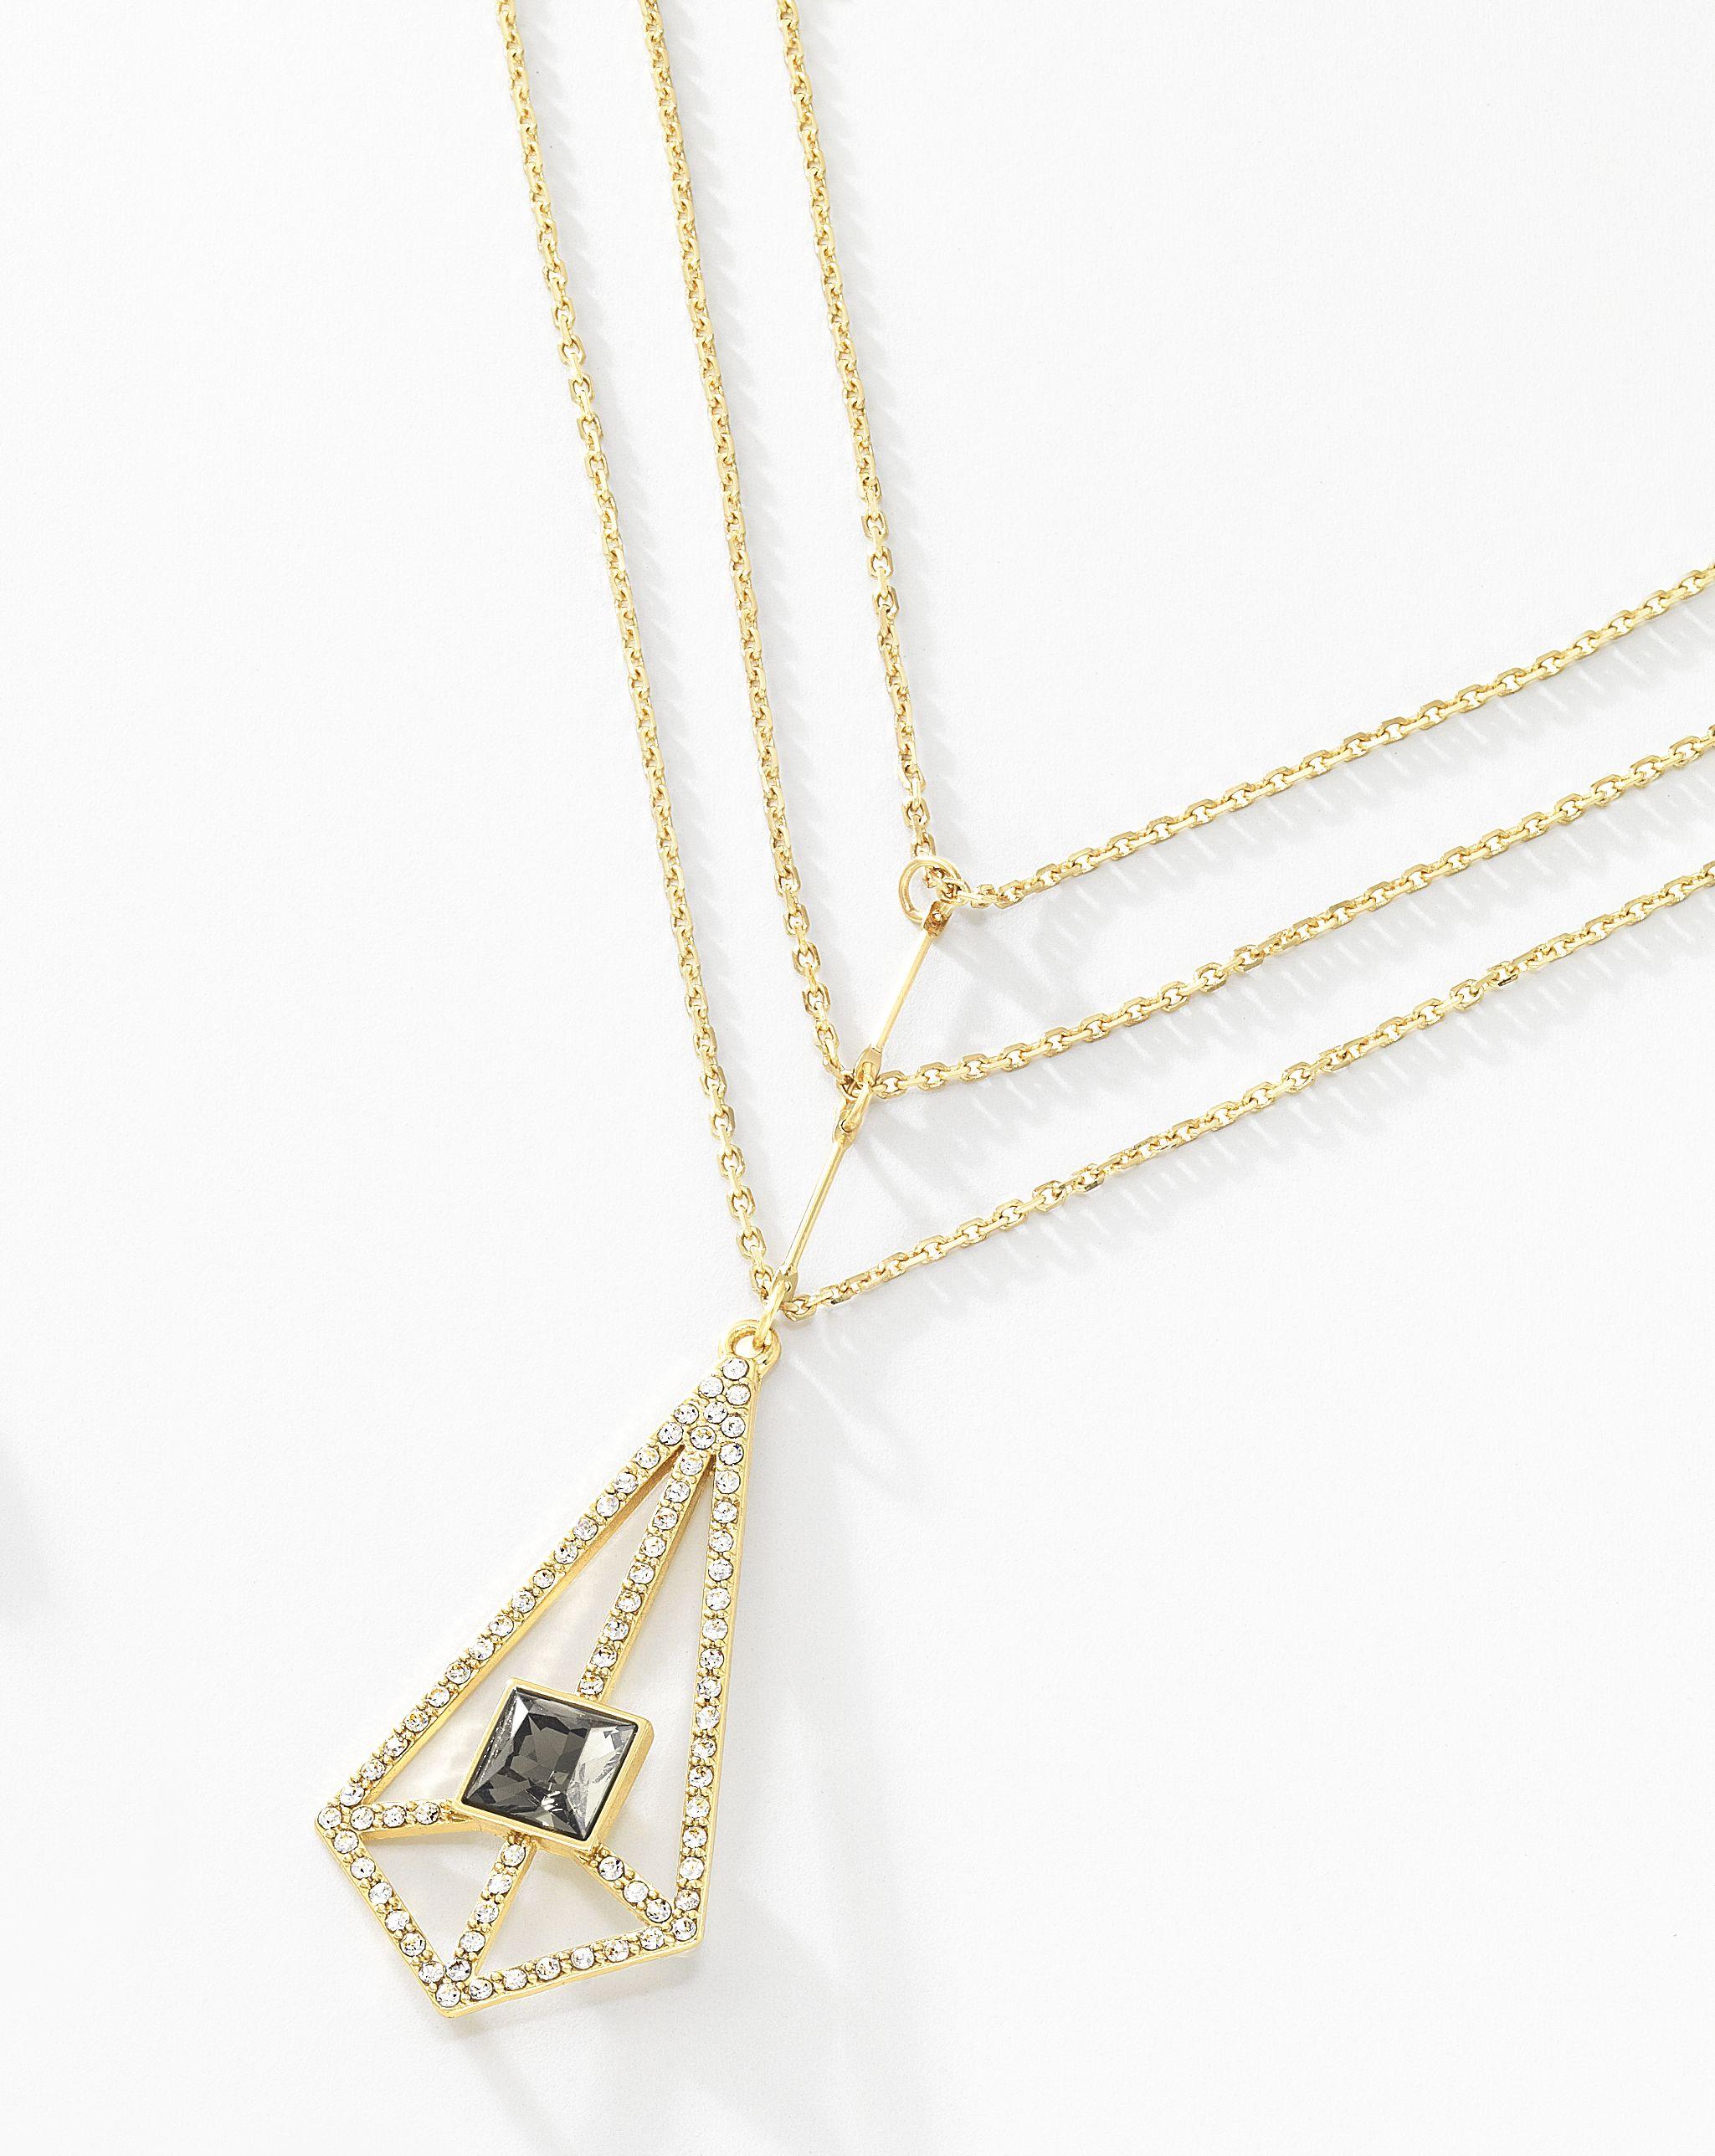 07a2b6d114ad Pin de Maricela Adarga Valencia en Maricel AV Joyería NICE | Jewelry ...